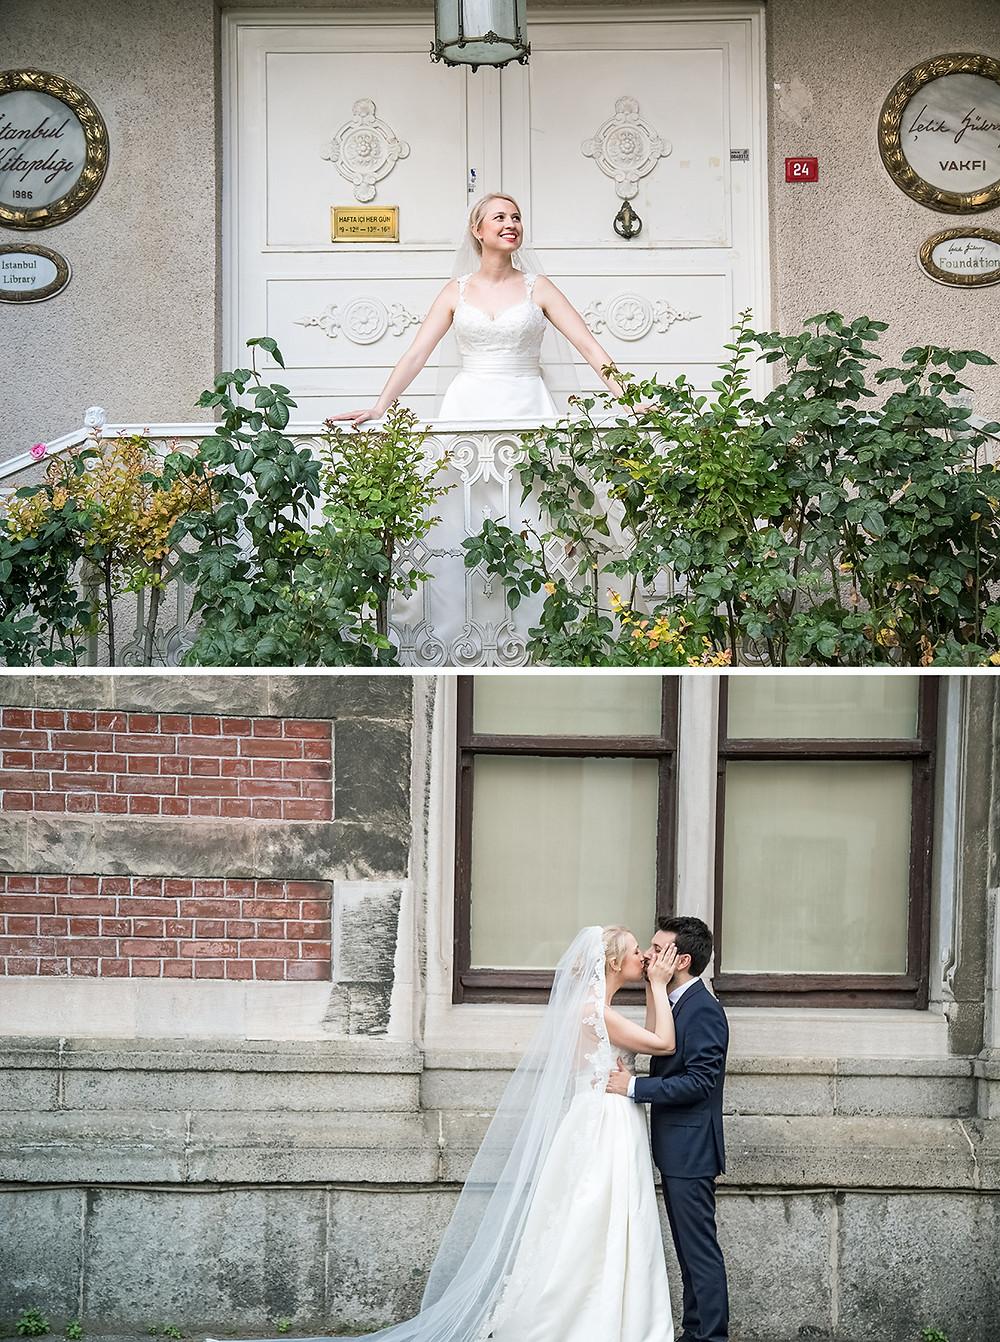 istanbul wedding photography couple session